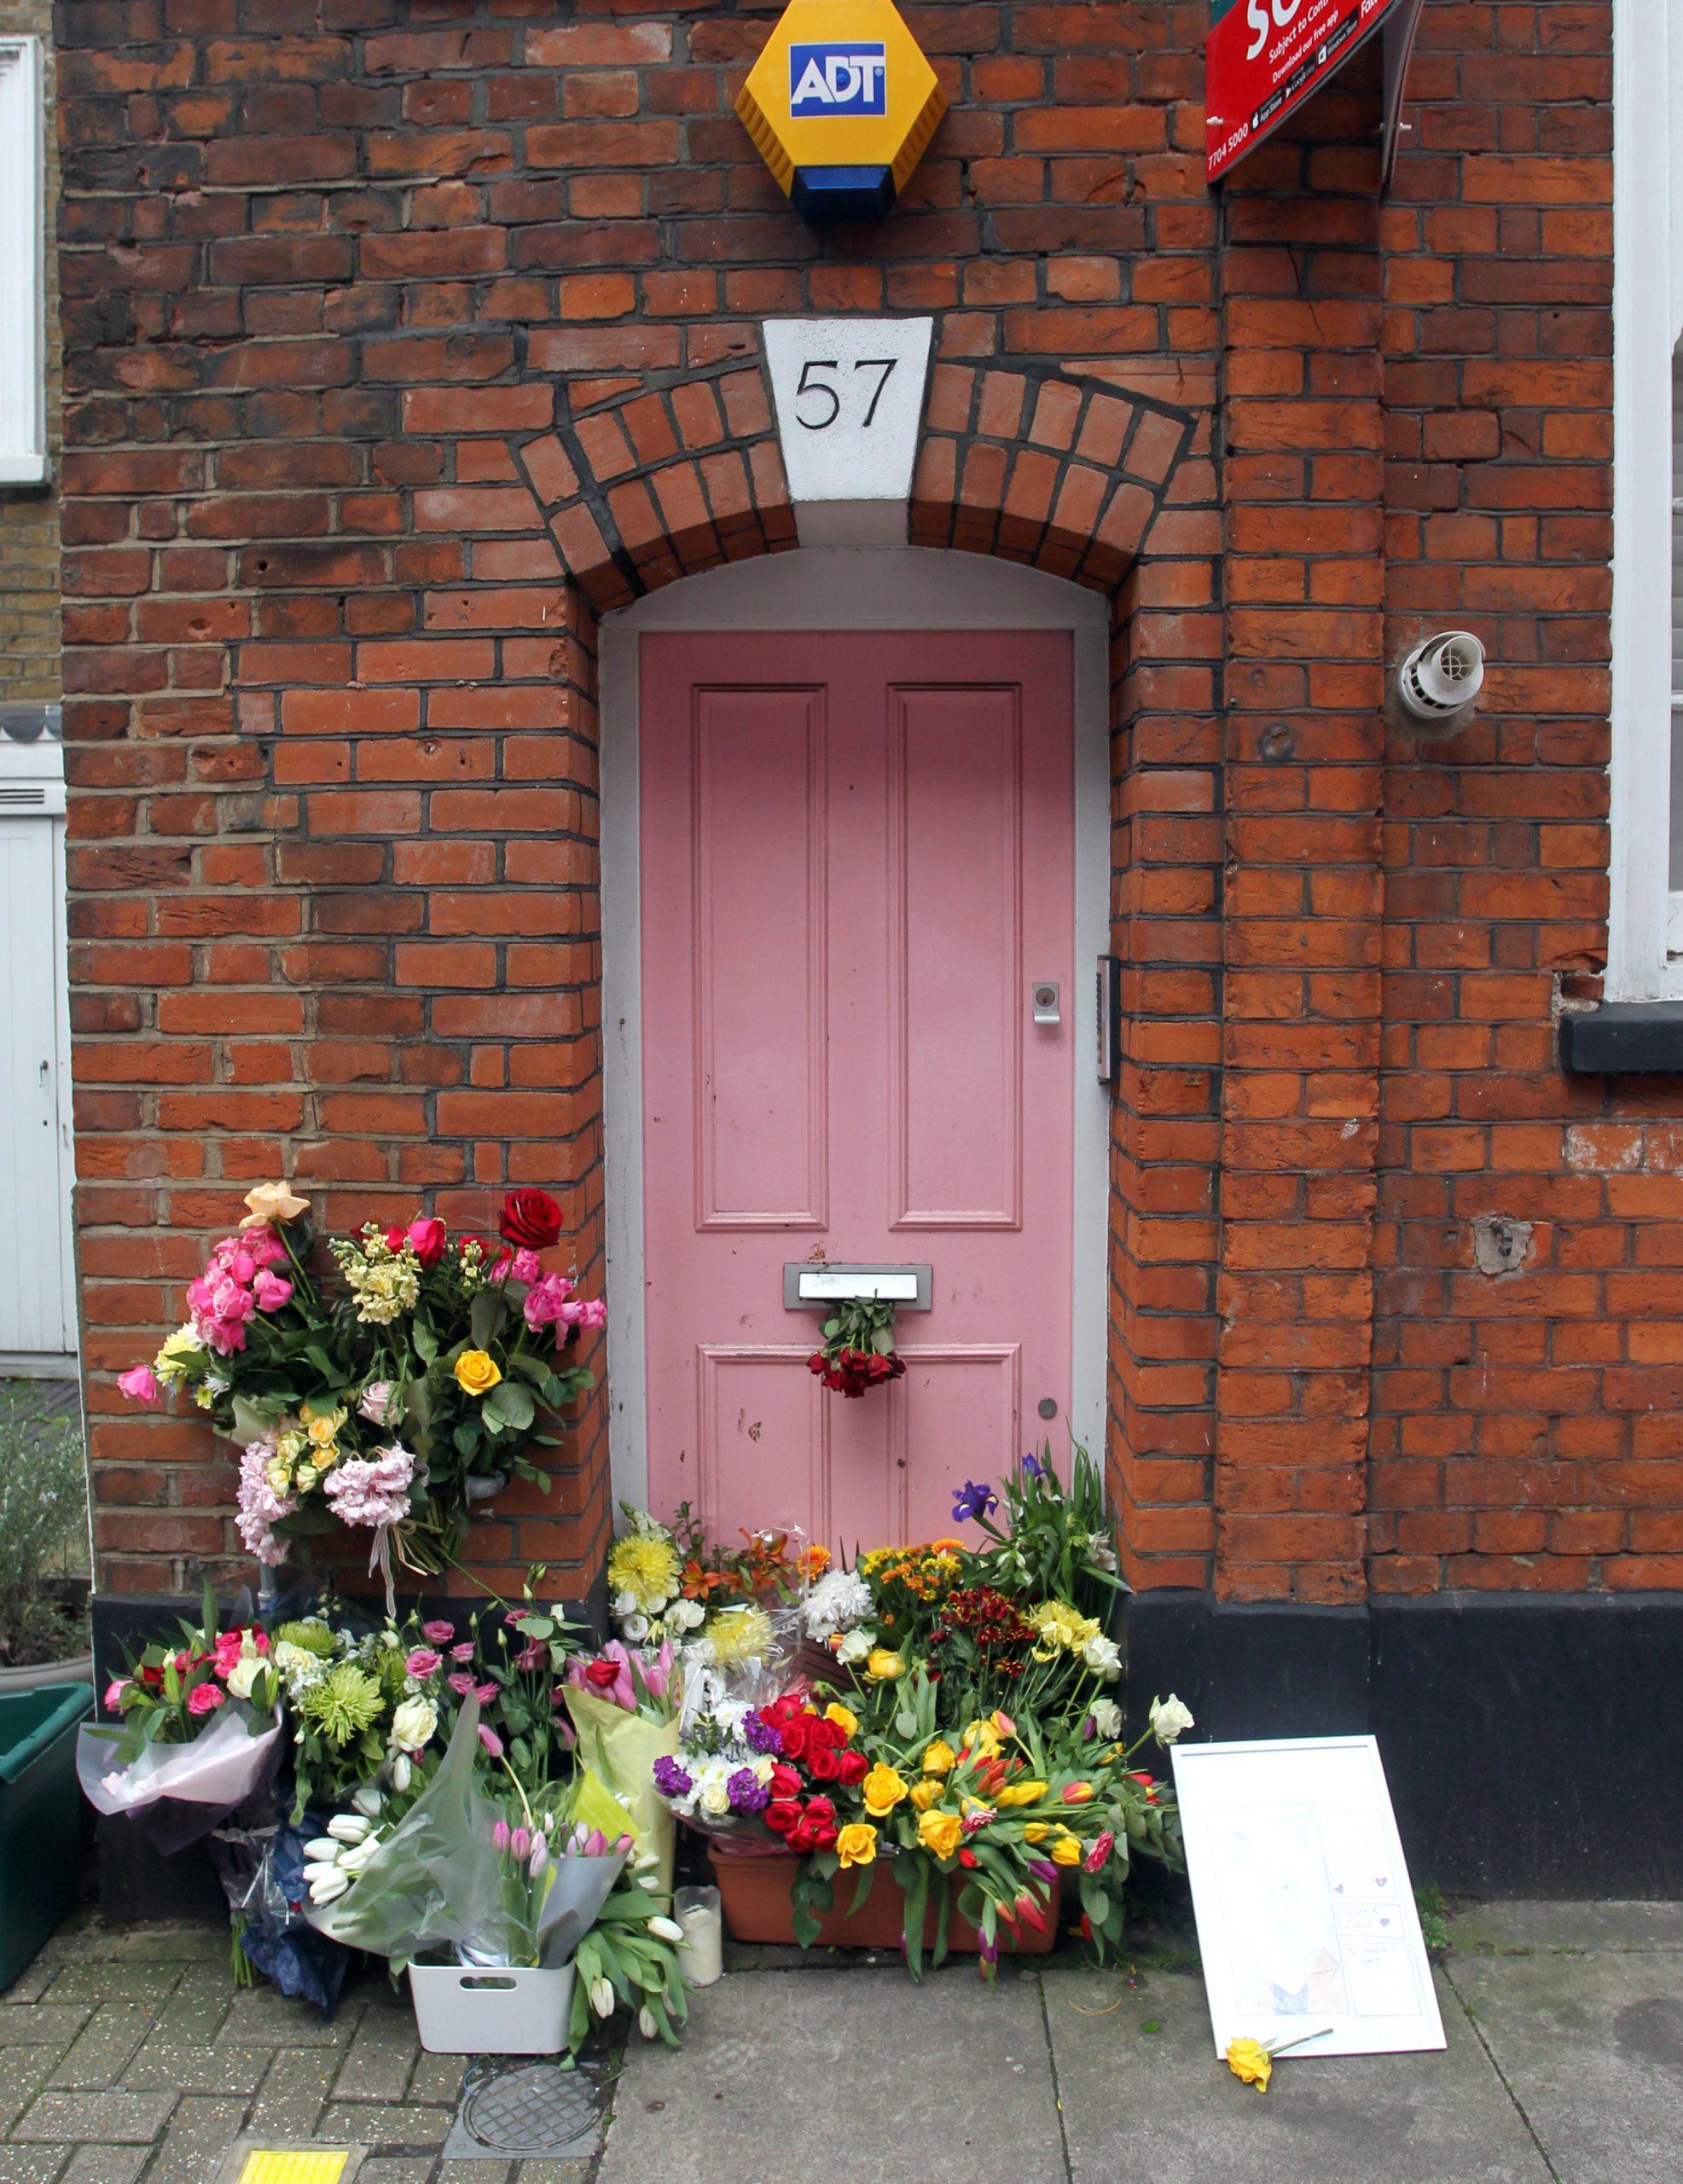 Caroline Flack's home